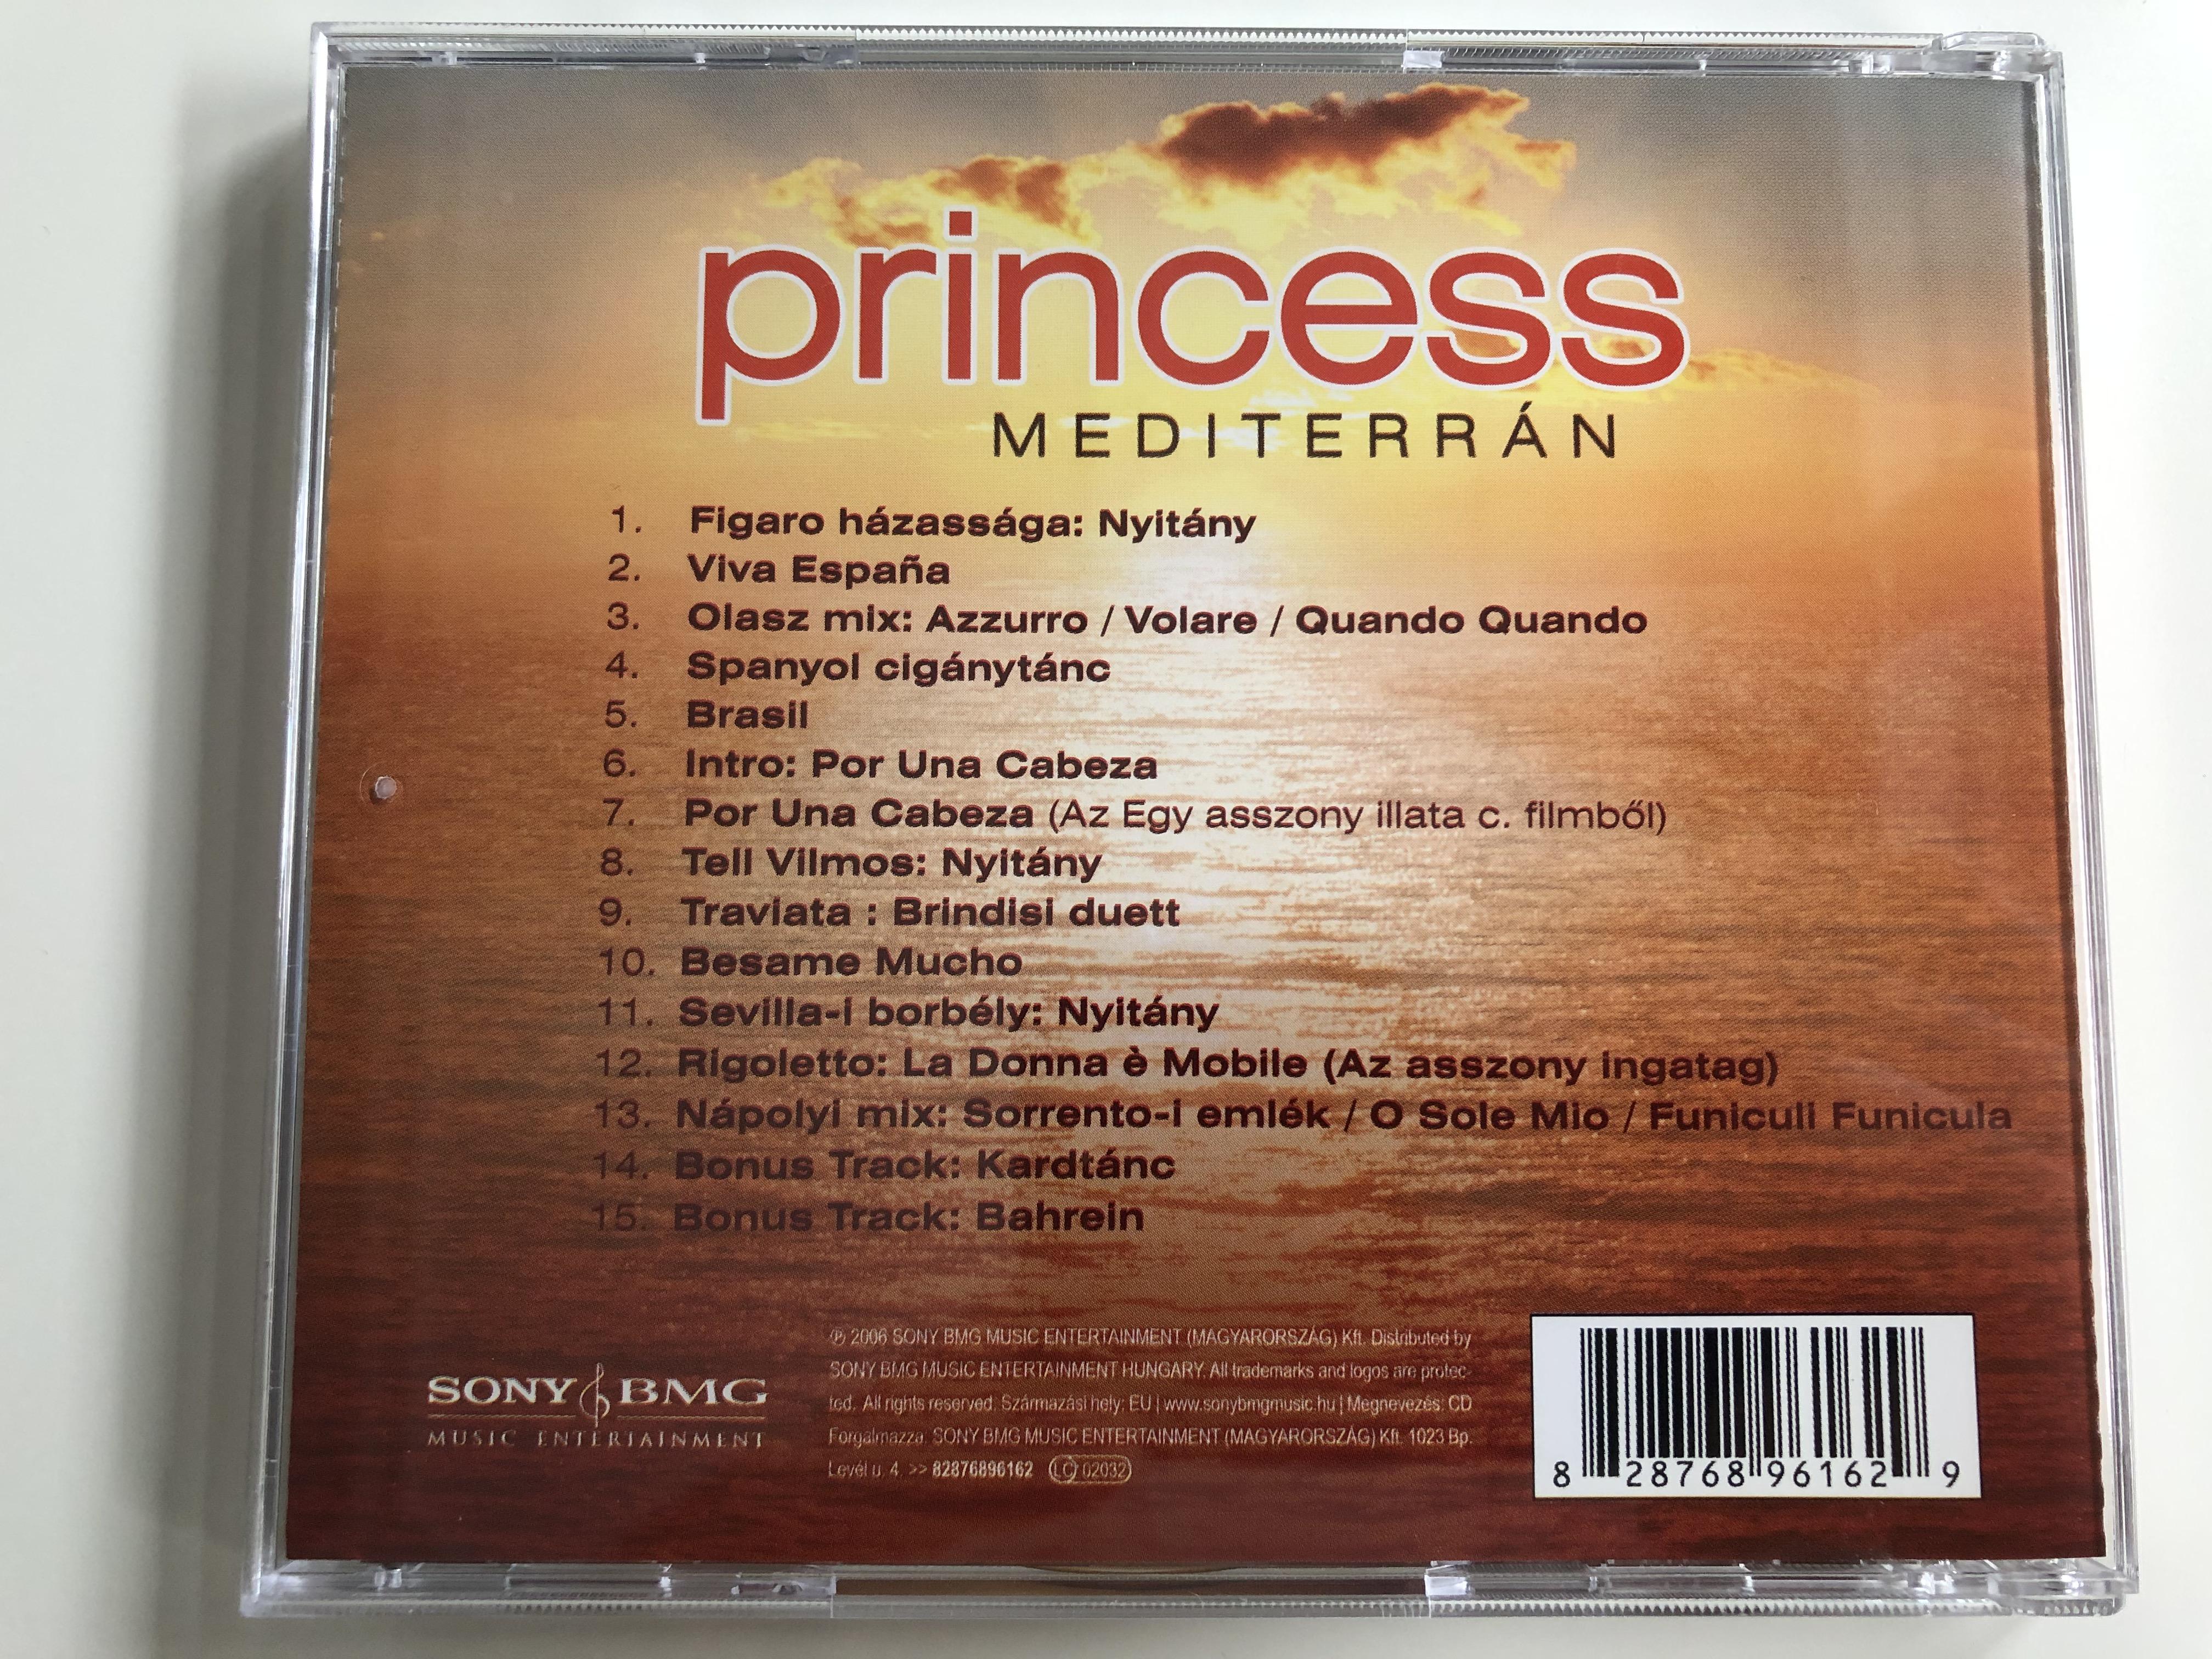 princess-mediterr-n-sony-bmg-music-entertainment-audio-cd-2006-82876896162-9-.jpg